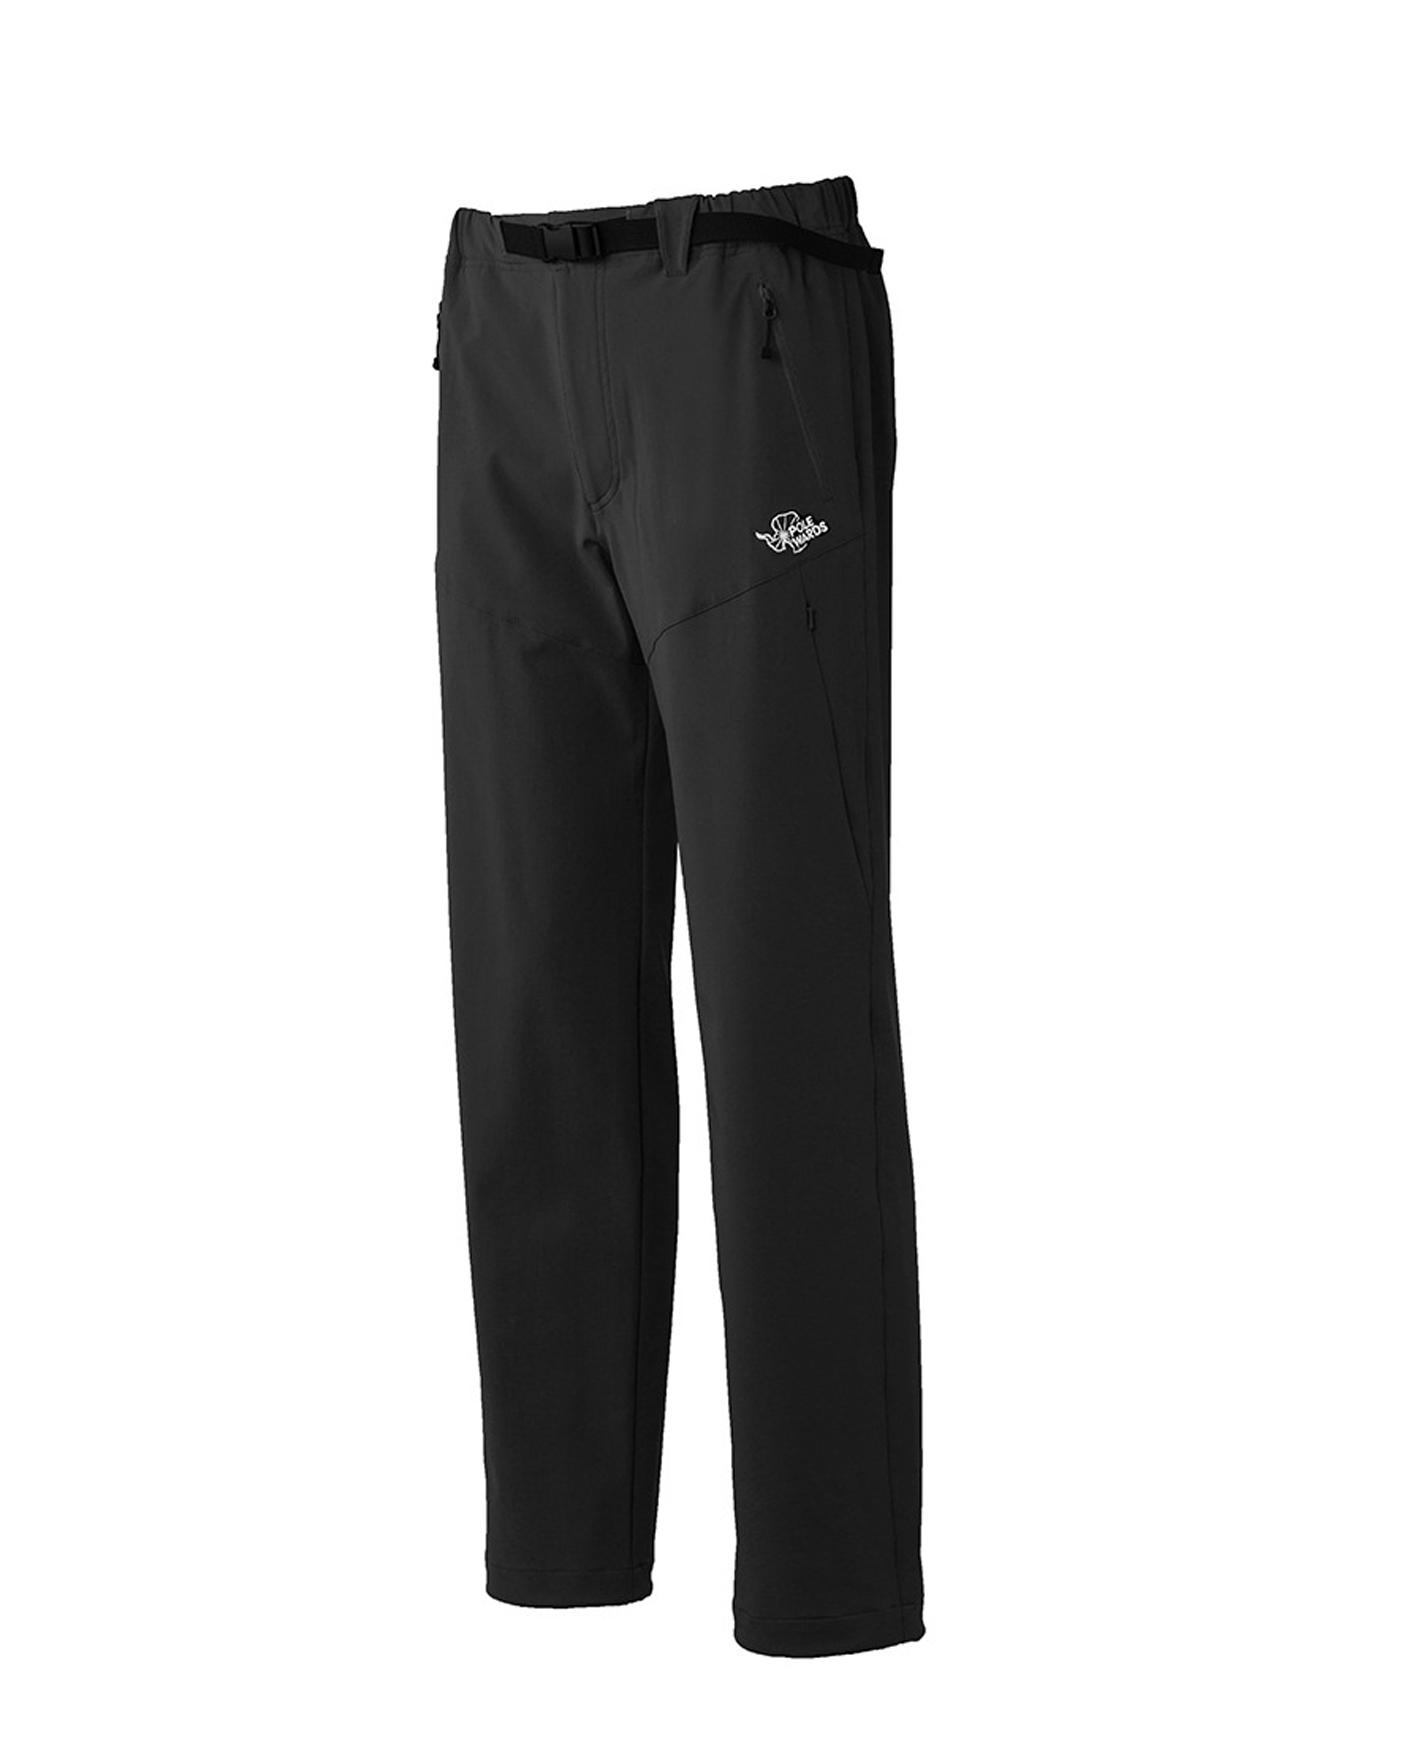 CORDURA Versatile Pants (コーデュラ バーサタイル パンツ)